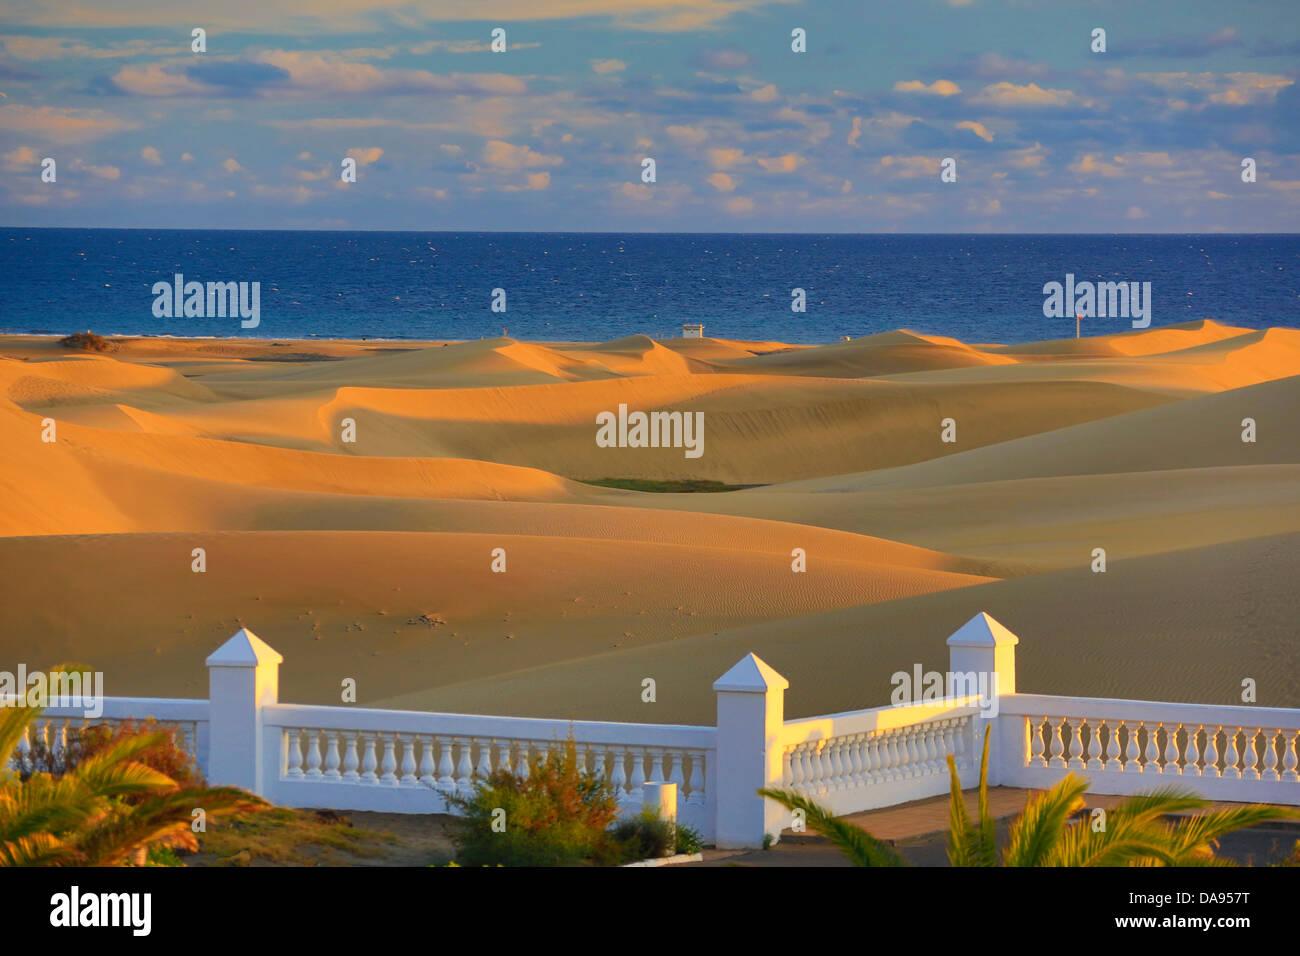 Spanien, Europa, Kanarische Inseln, Gran Canaria, Maspalomas, Stadt, bunten, Dünen, Wüste, berühmt, Stockbild